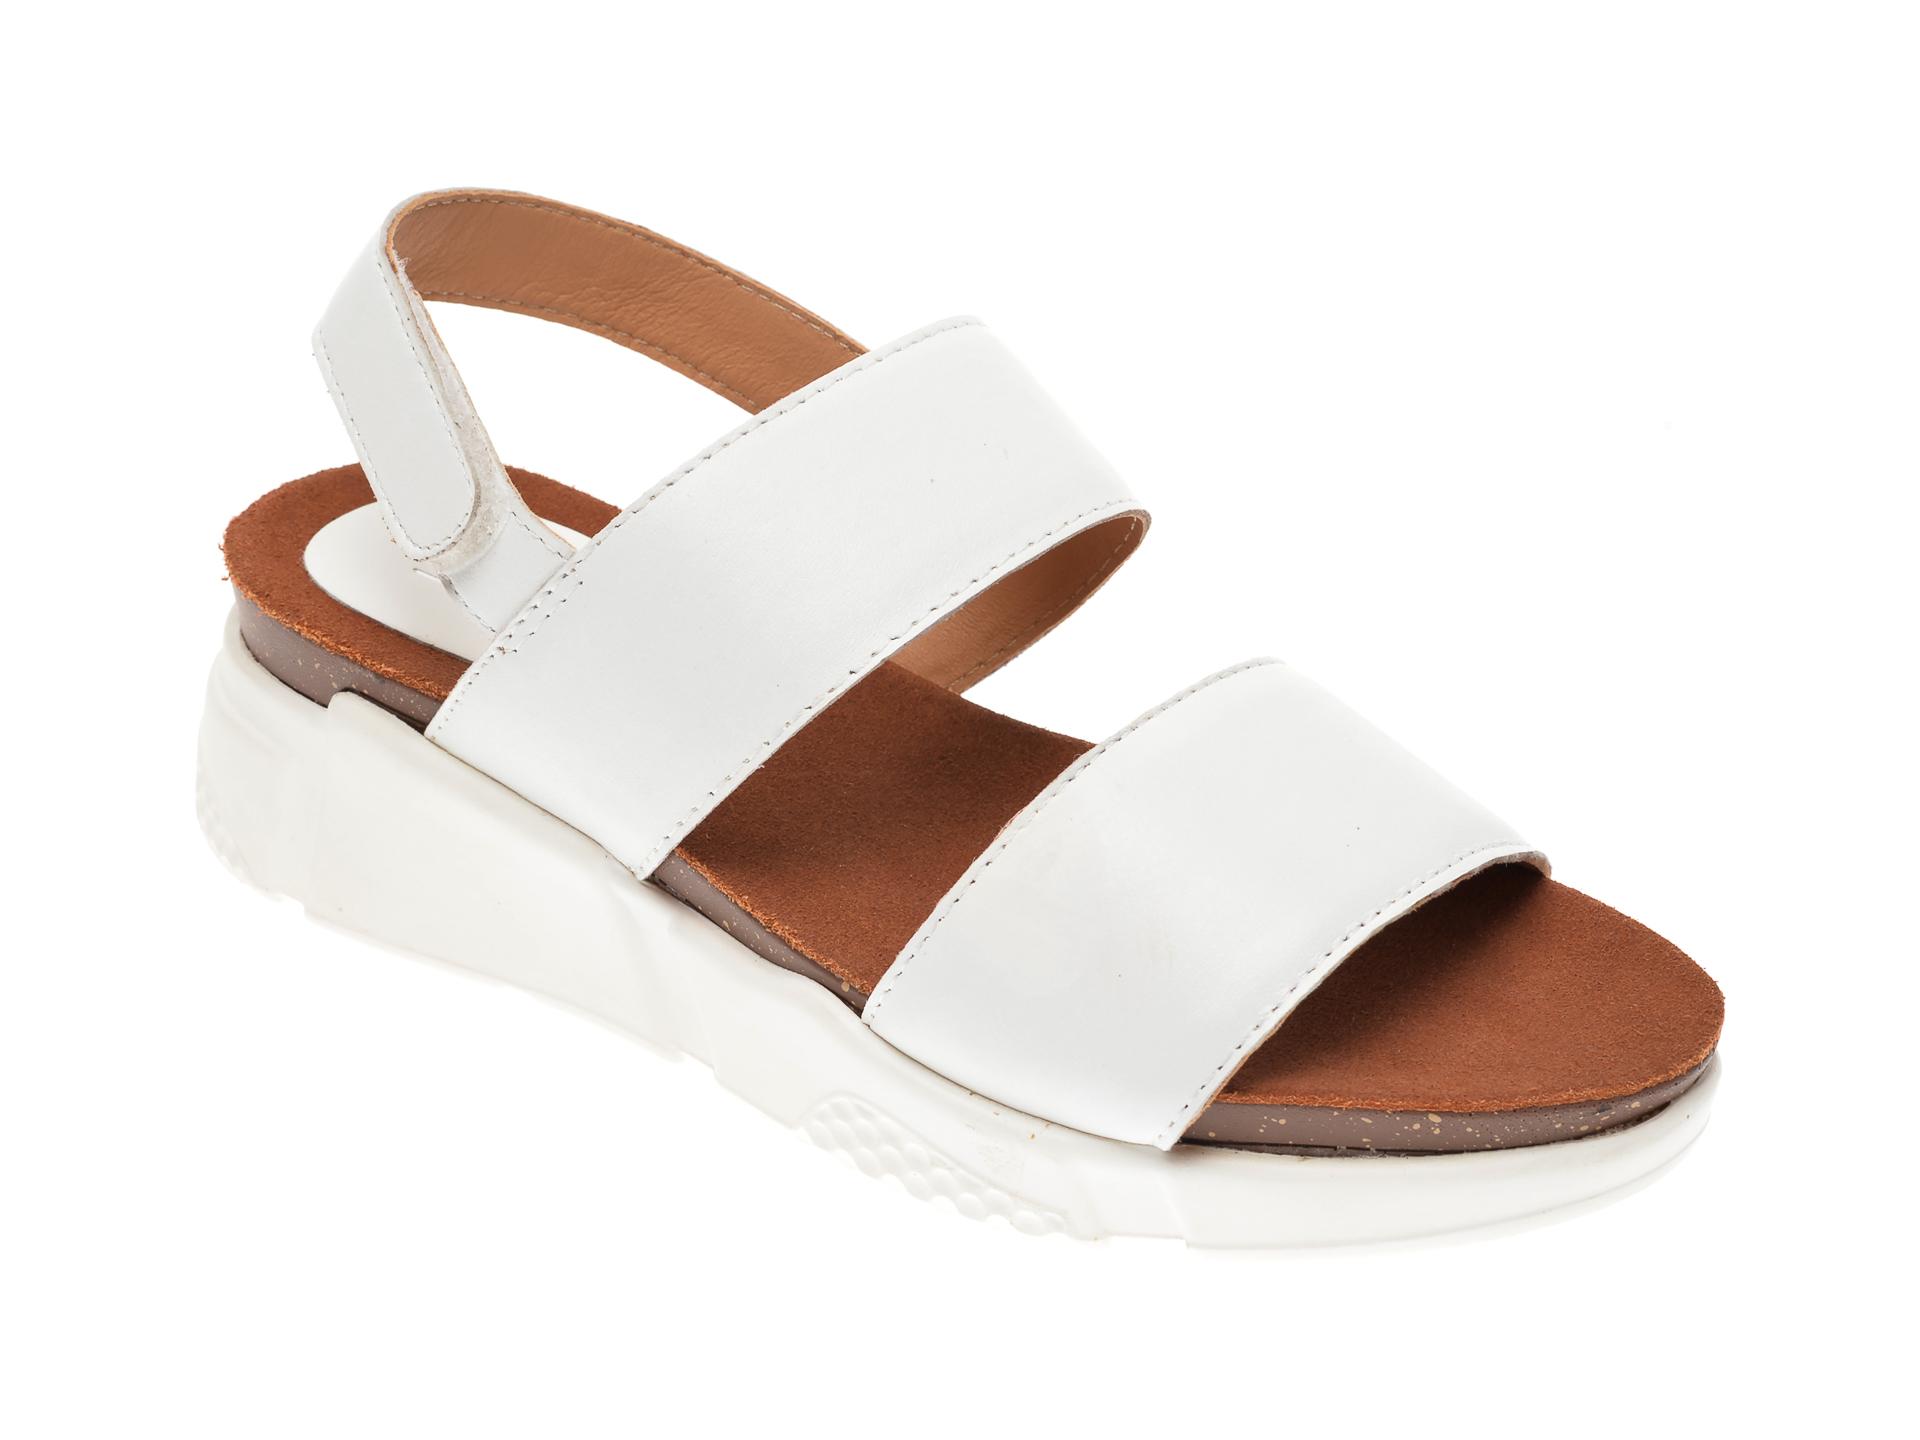 Sandale IMAGE albe, SH57, din piele naturala